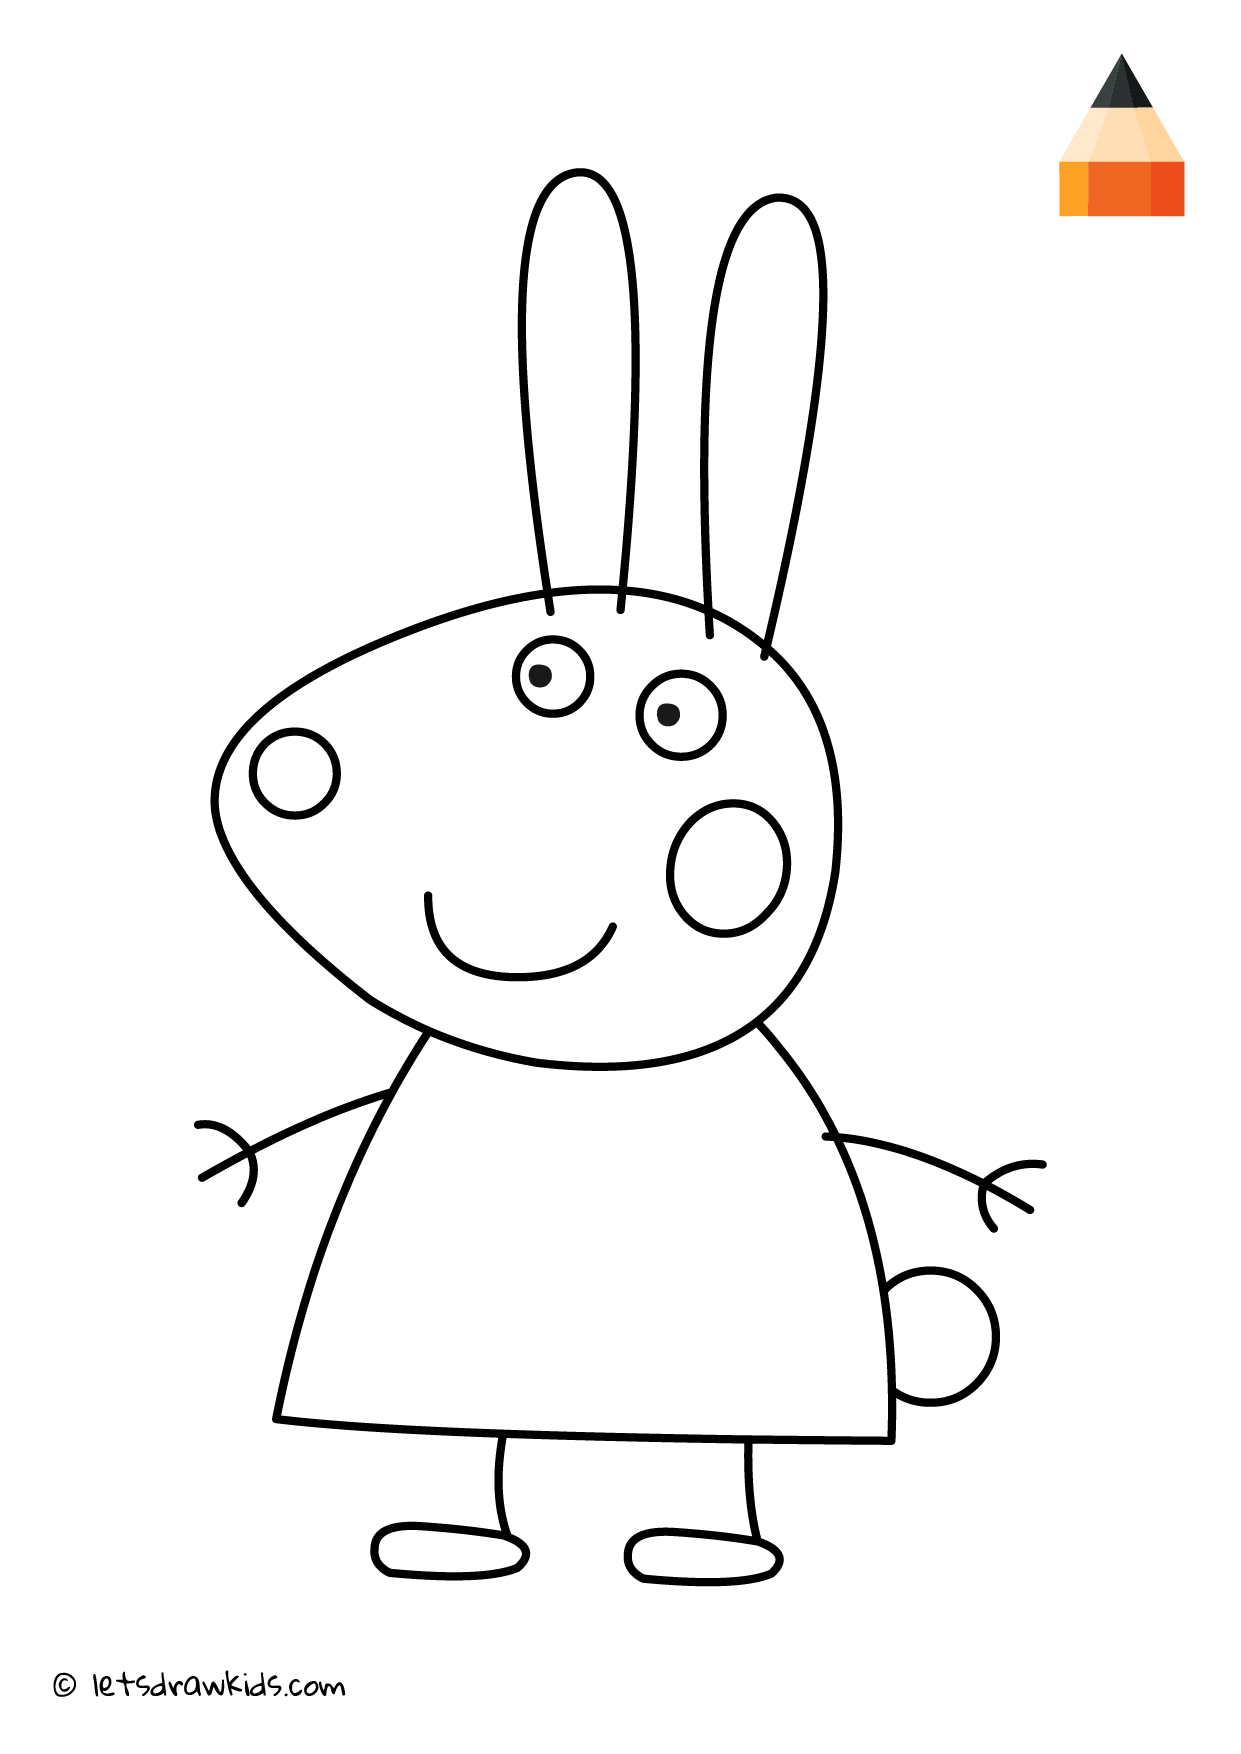 Coloring Page Peppa Pig Rebecca Rabbit Peppapig Coloring Page Peppa Pig Rebecca Rabbit Peppa Pig Coloring Pages Peppa Pig Colouring Peppa Pig Drawing